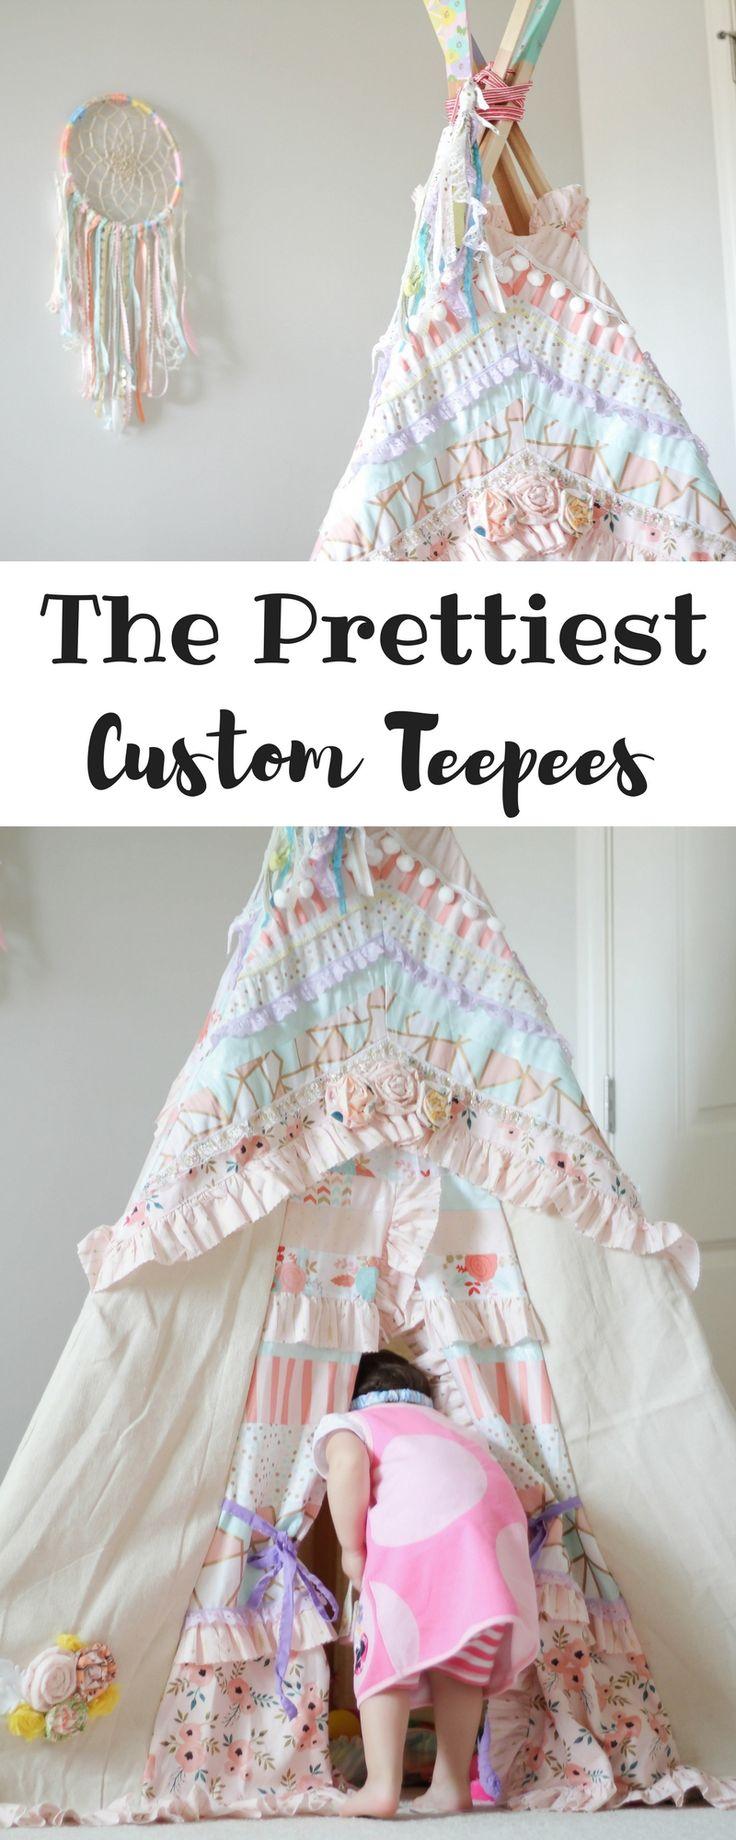 The most gorgeous Teepees ever! | Toddler Teepee | Nursery Decor | Big Girl Bedroom | Custom Teepee | Busy Little Izzy Blog